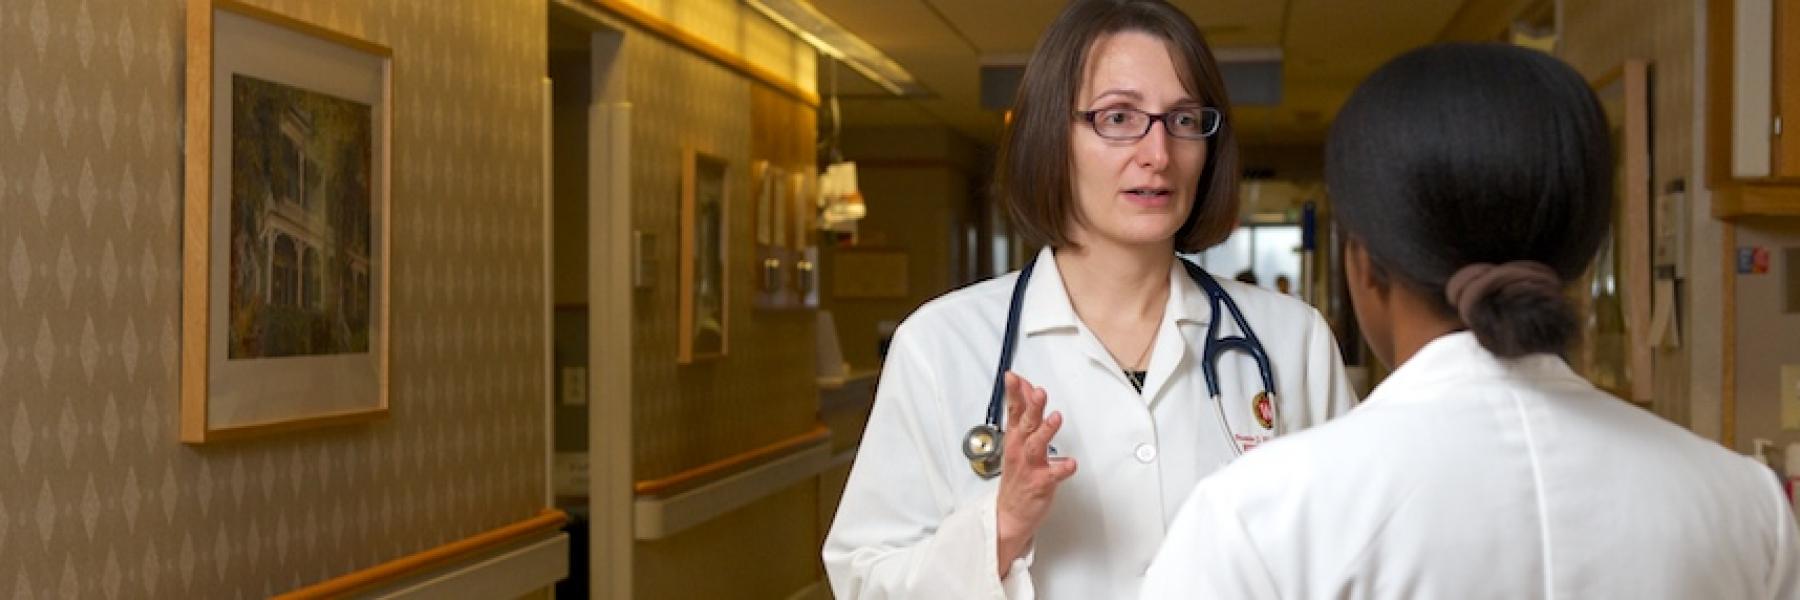 University of Wisconsin Rheumatology Fellowship Program